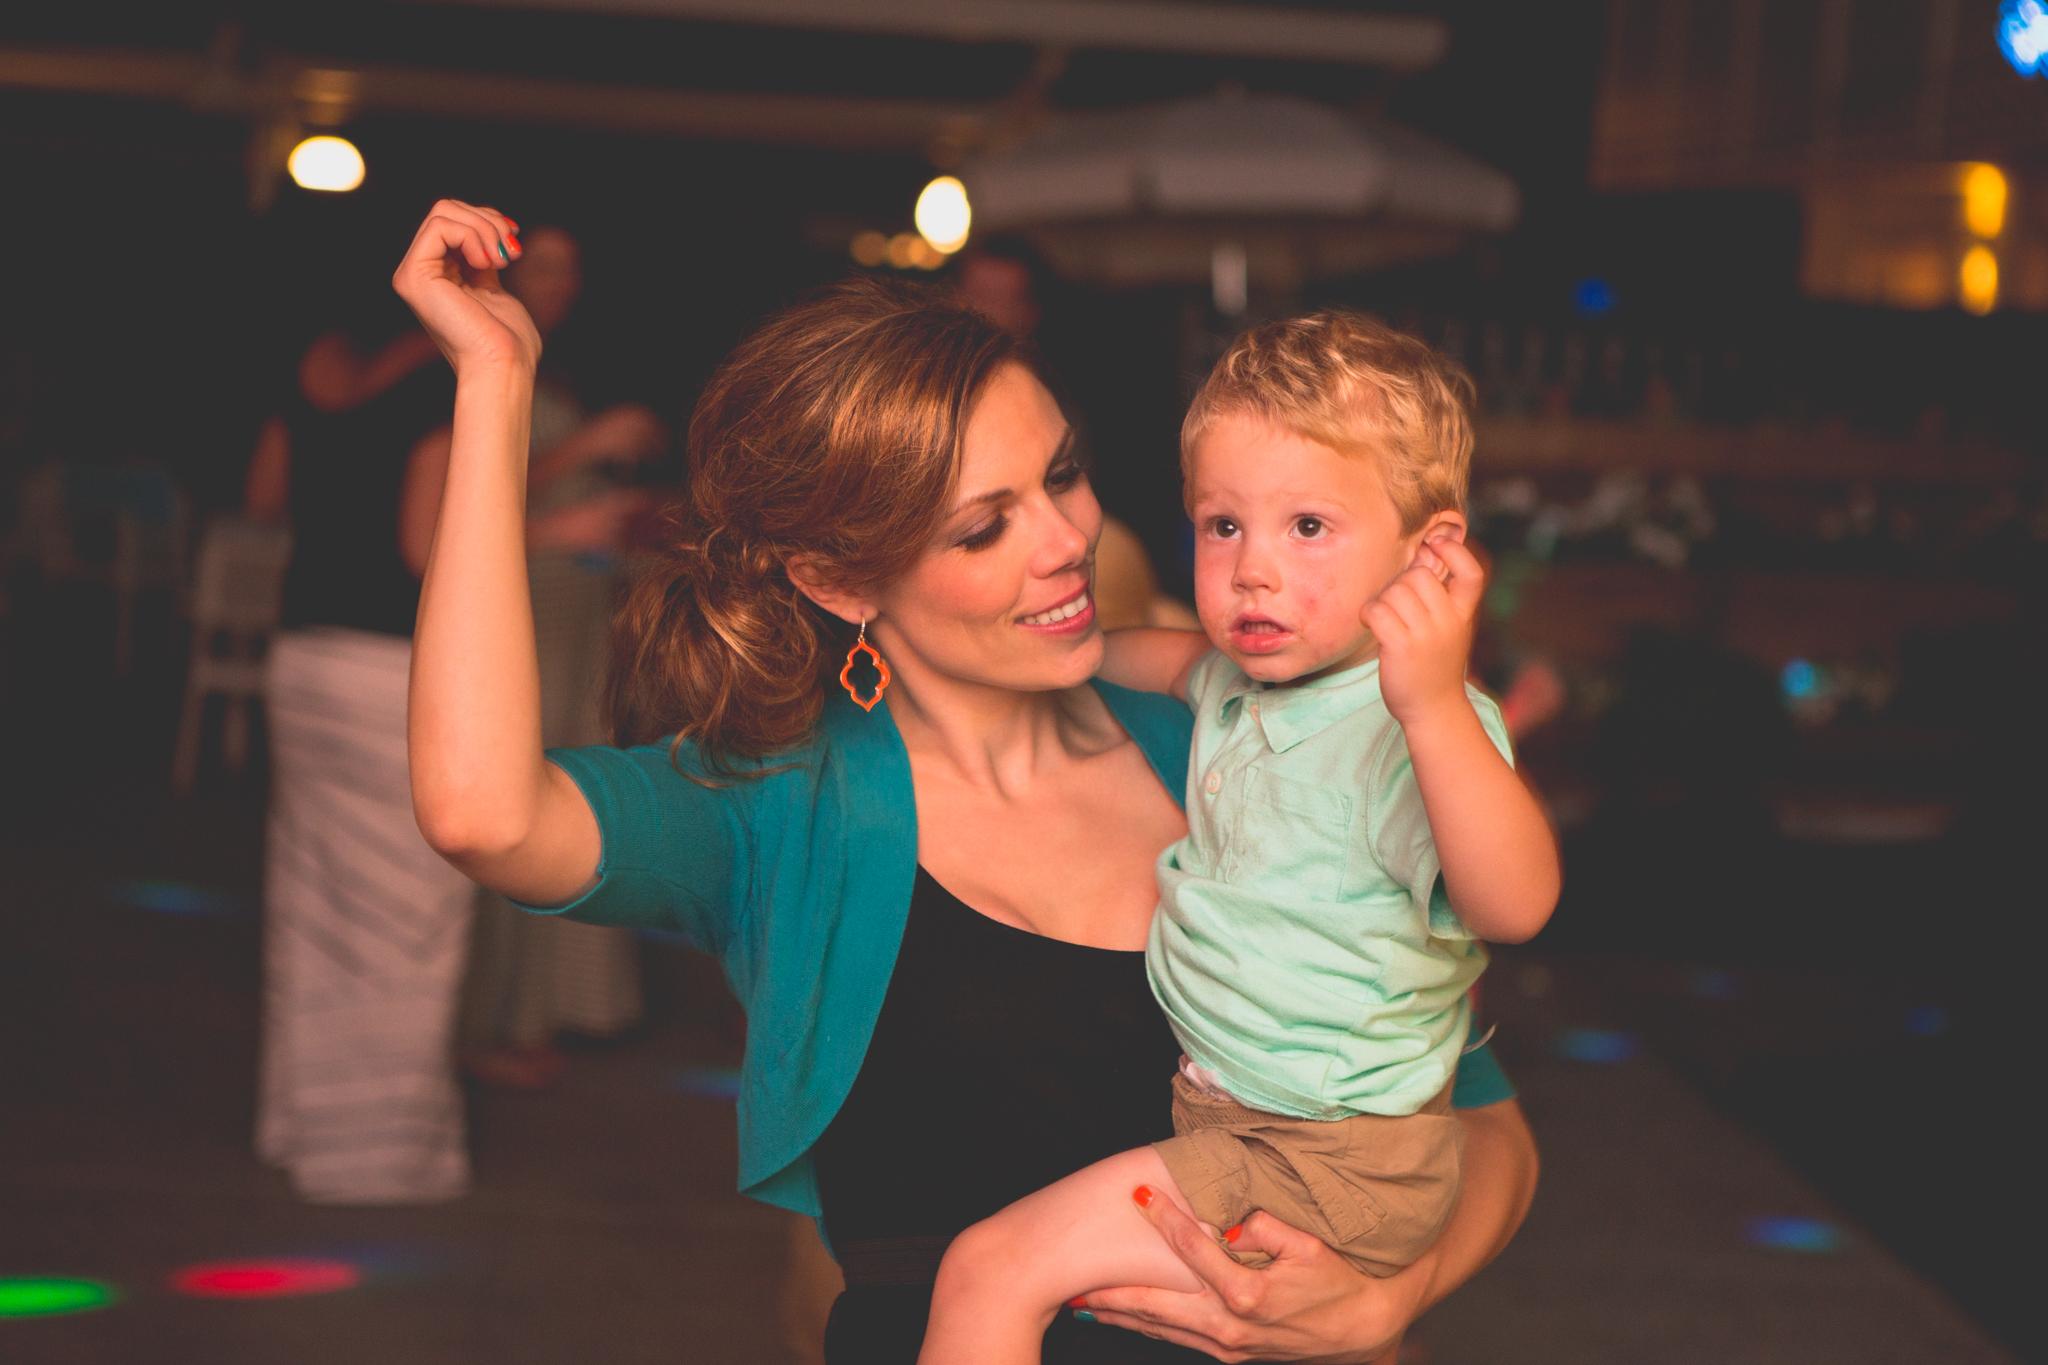 as-wedding-photo-mom-son-ole-dance